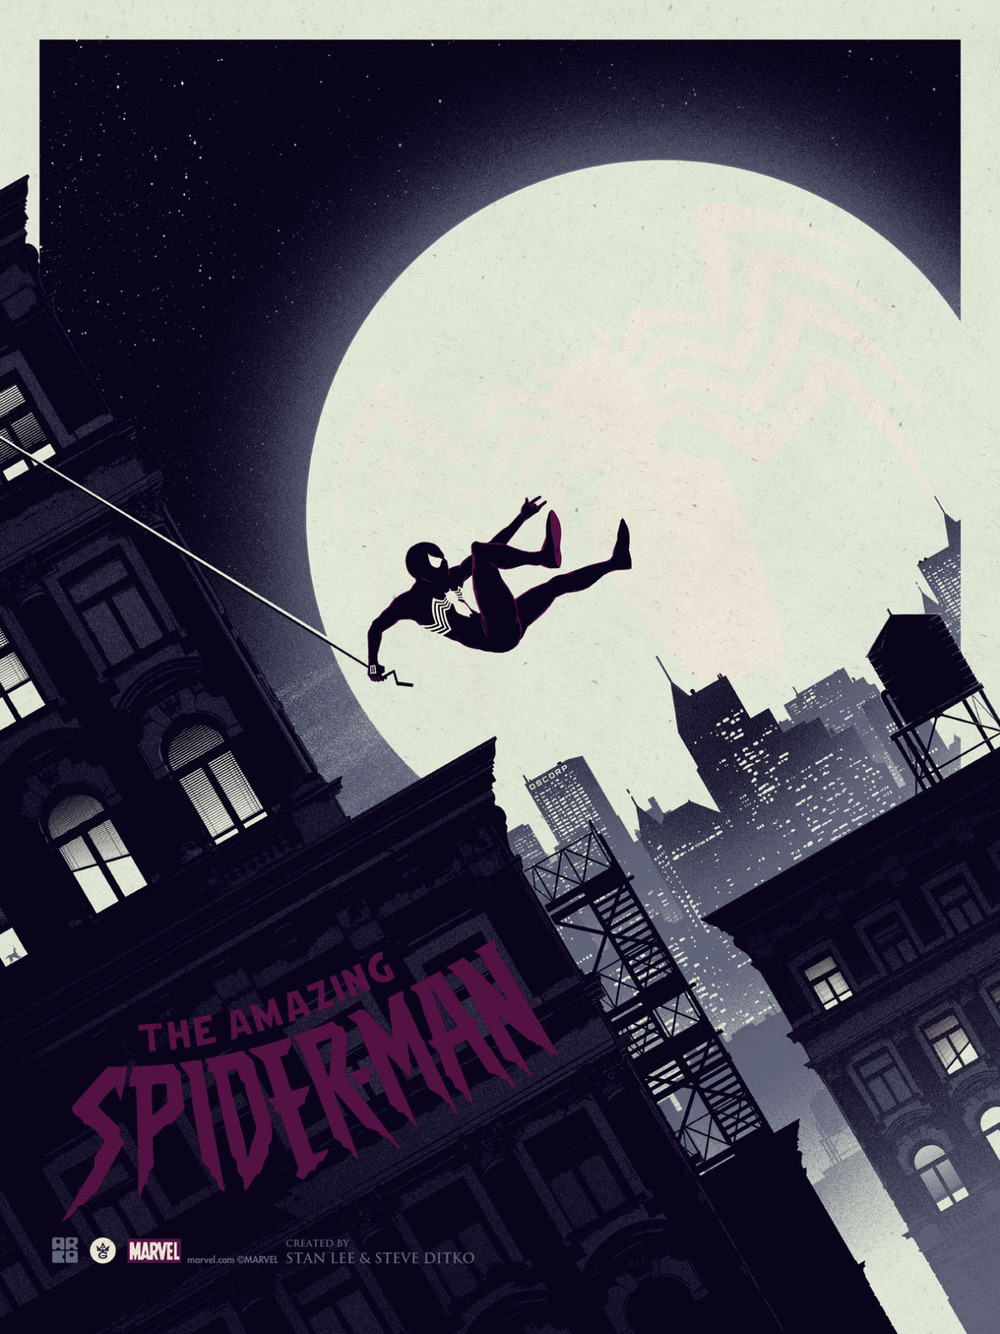 the-amazing-spider-man-art-by-matt-ferguson4